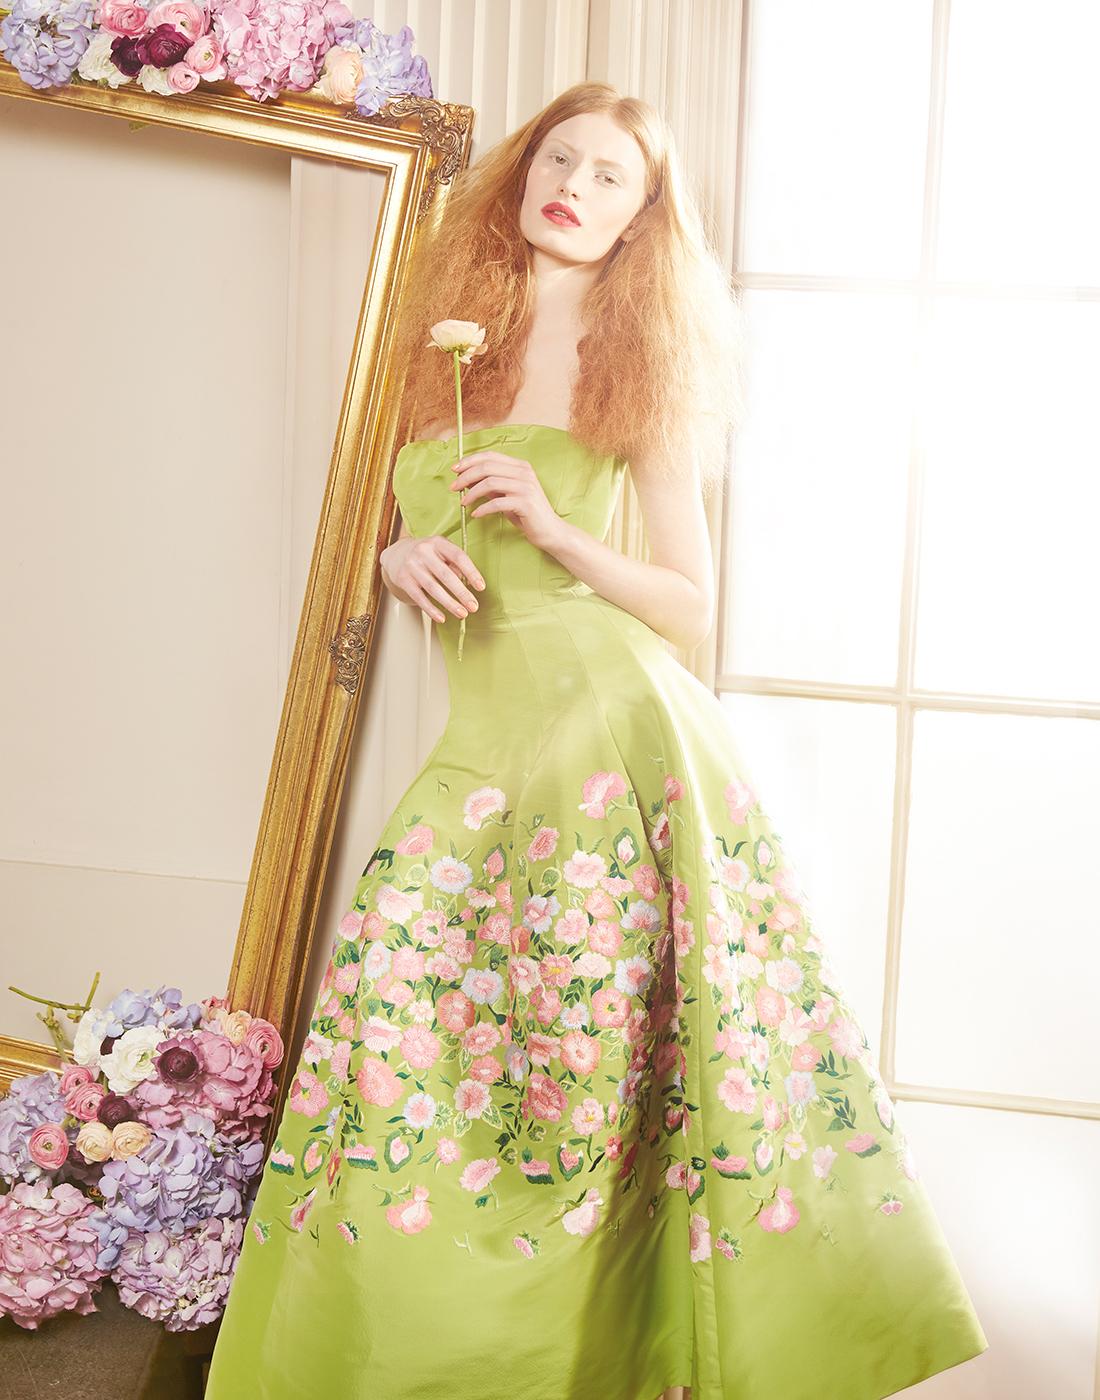 Tale of the Flower Girl - Harrods Magazine / Stephanie Hall - фото Lucia Giacani